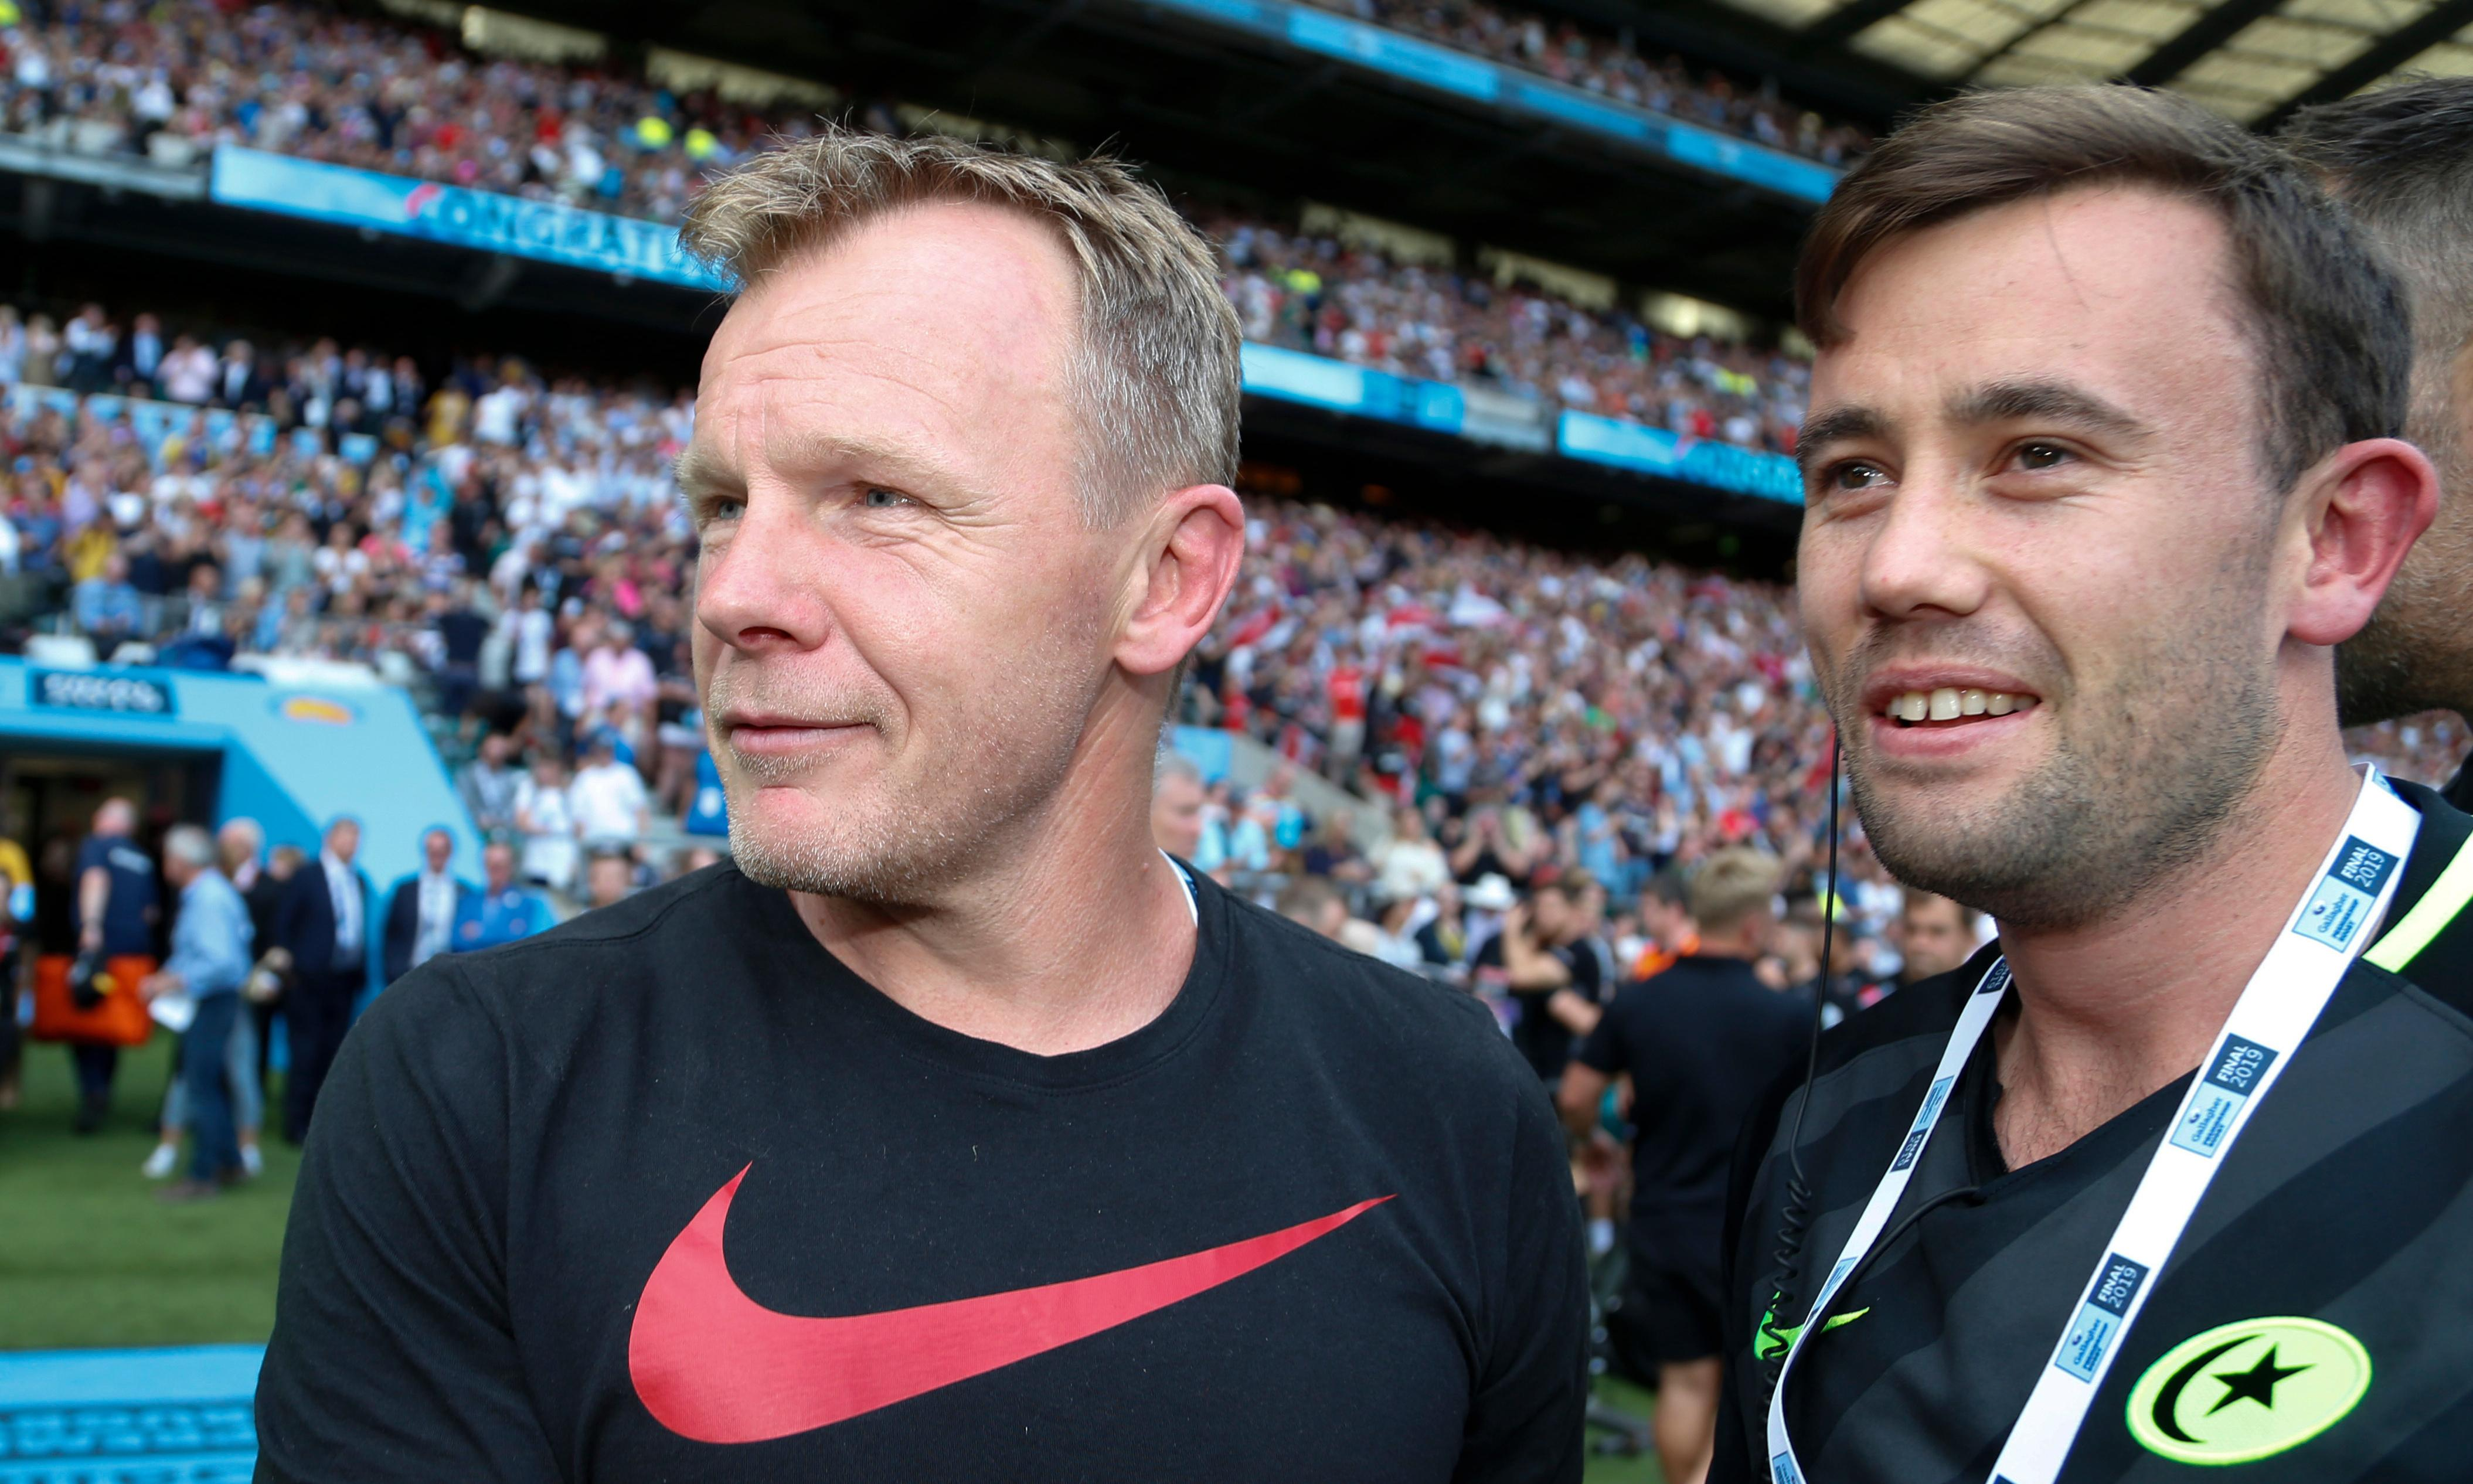 Saracens' triumph stiffens Mark McCall's resolve to rebuff a Test role